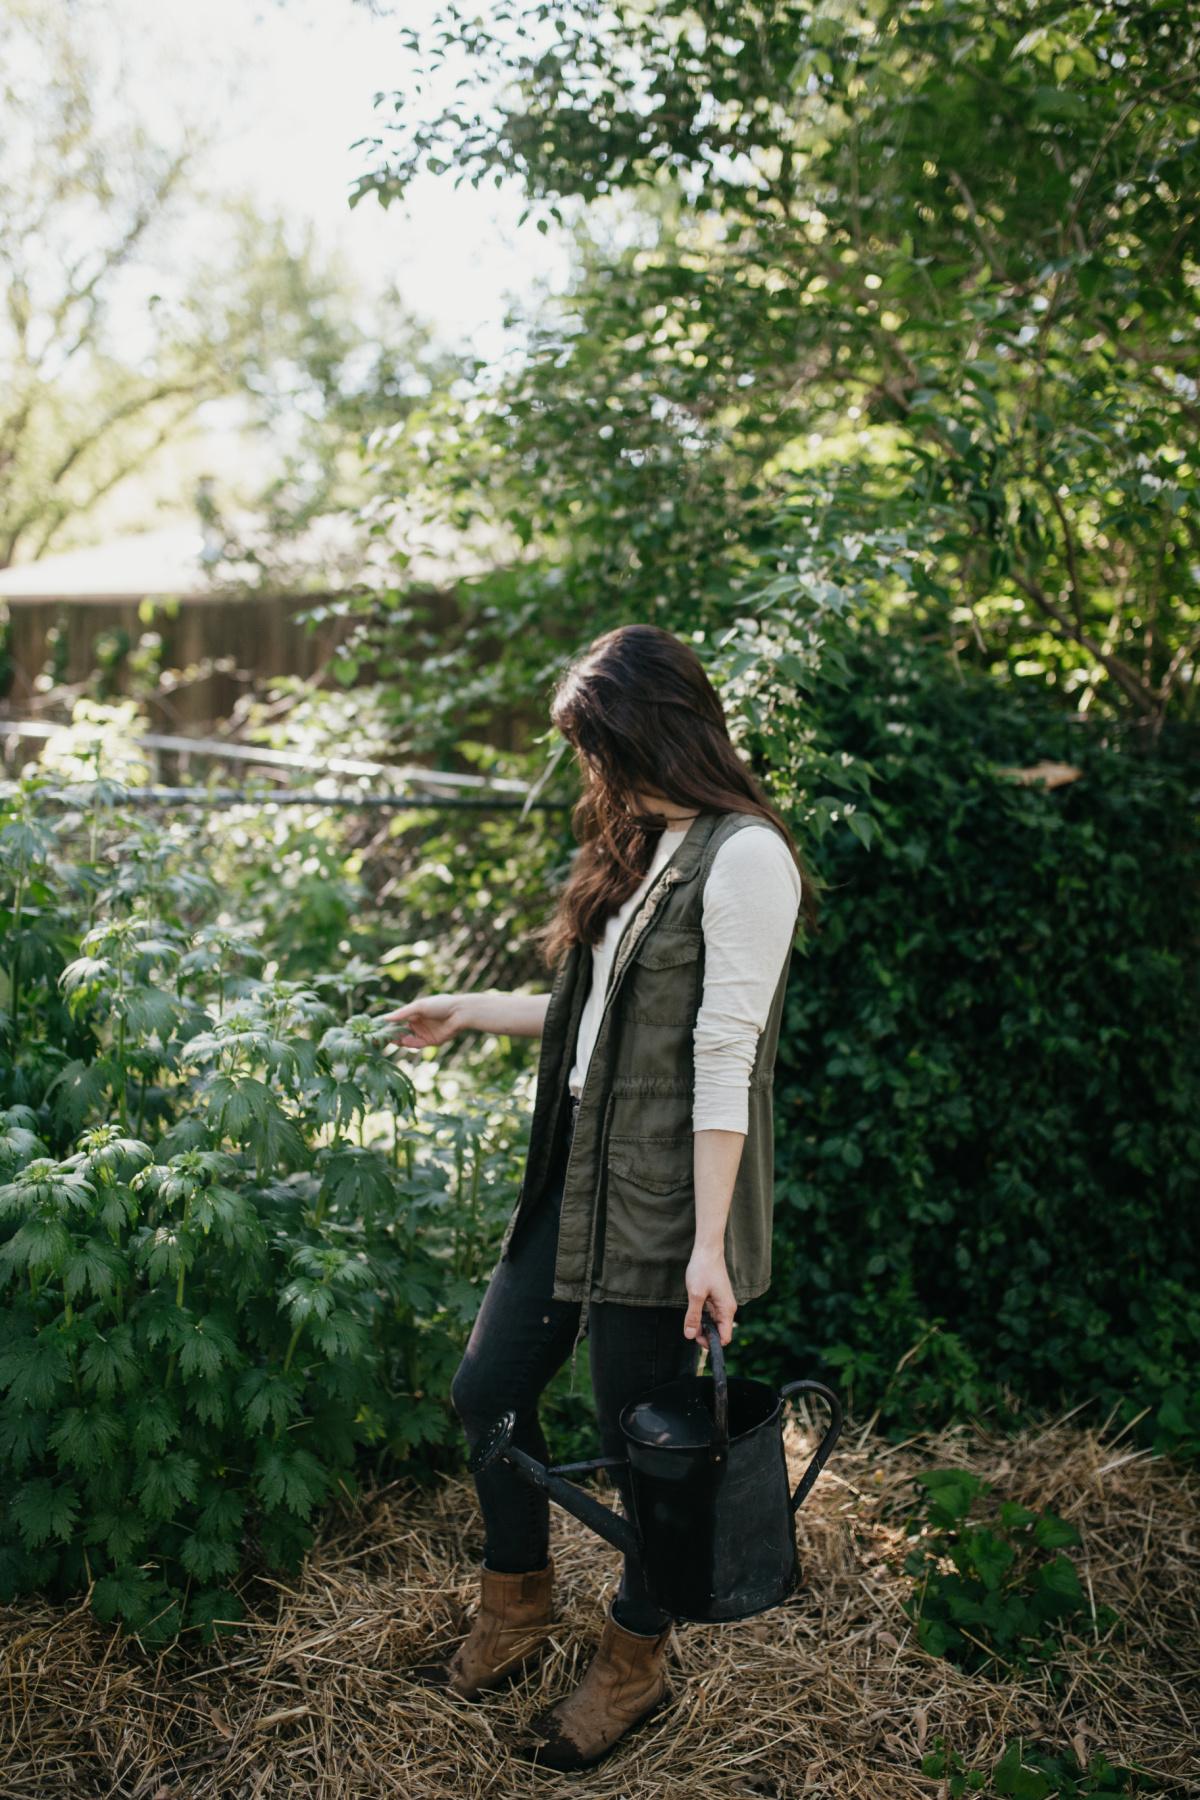 woman harvesting motherwort